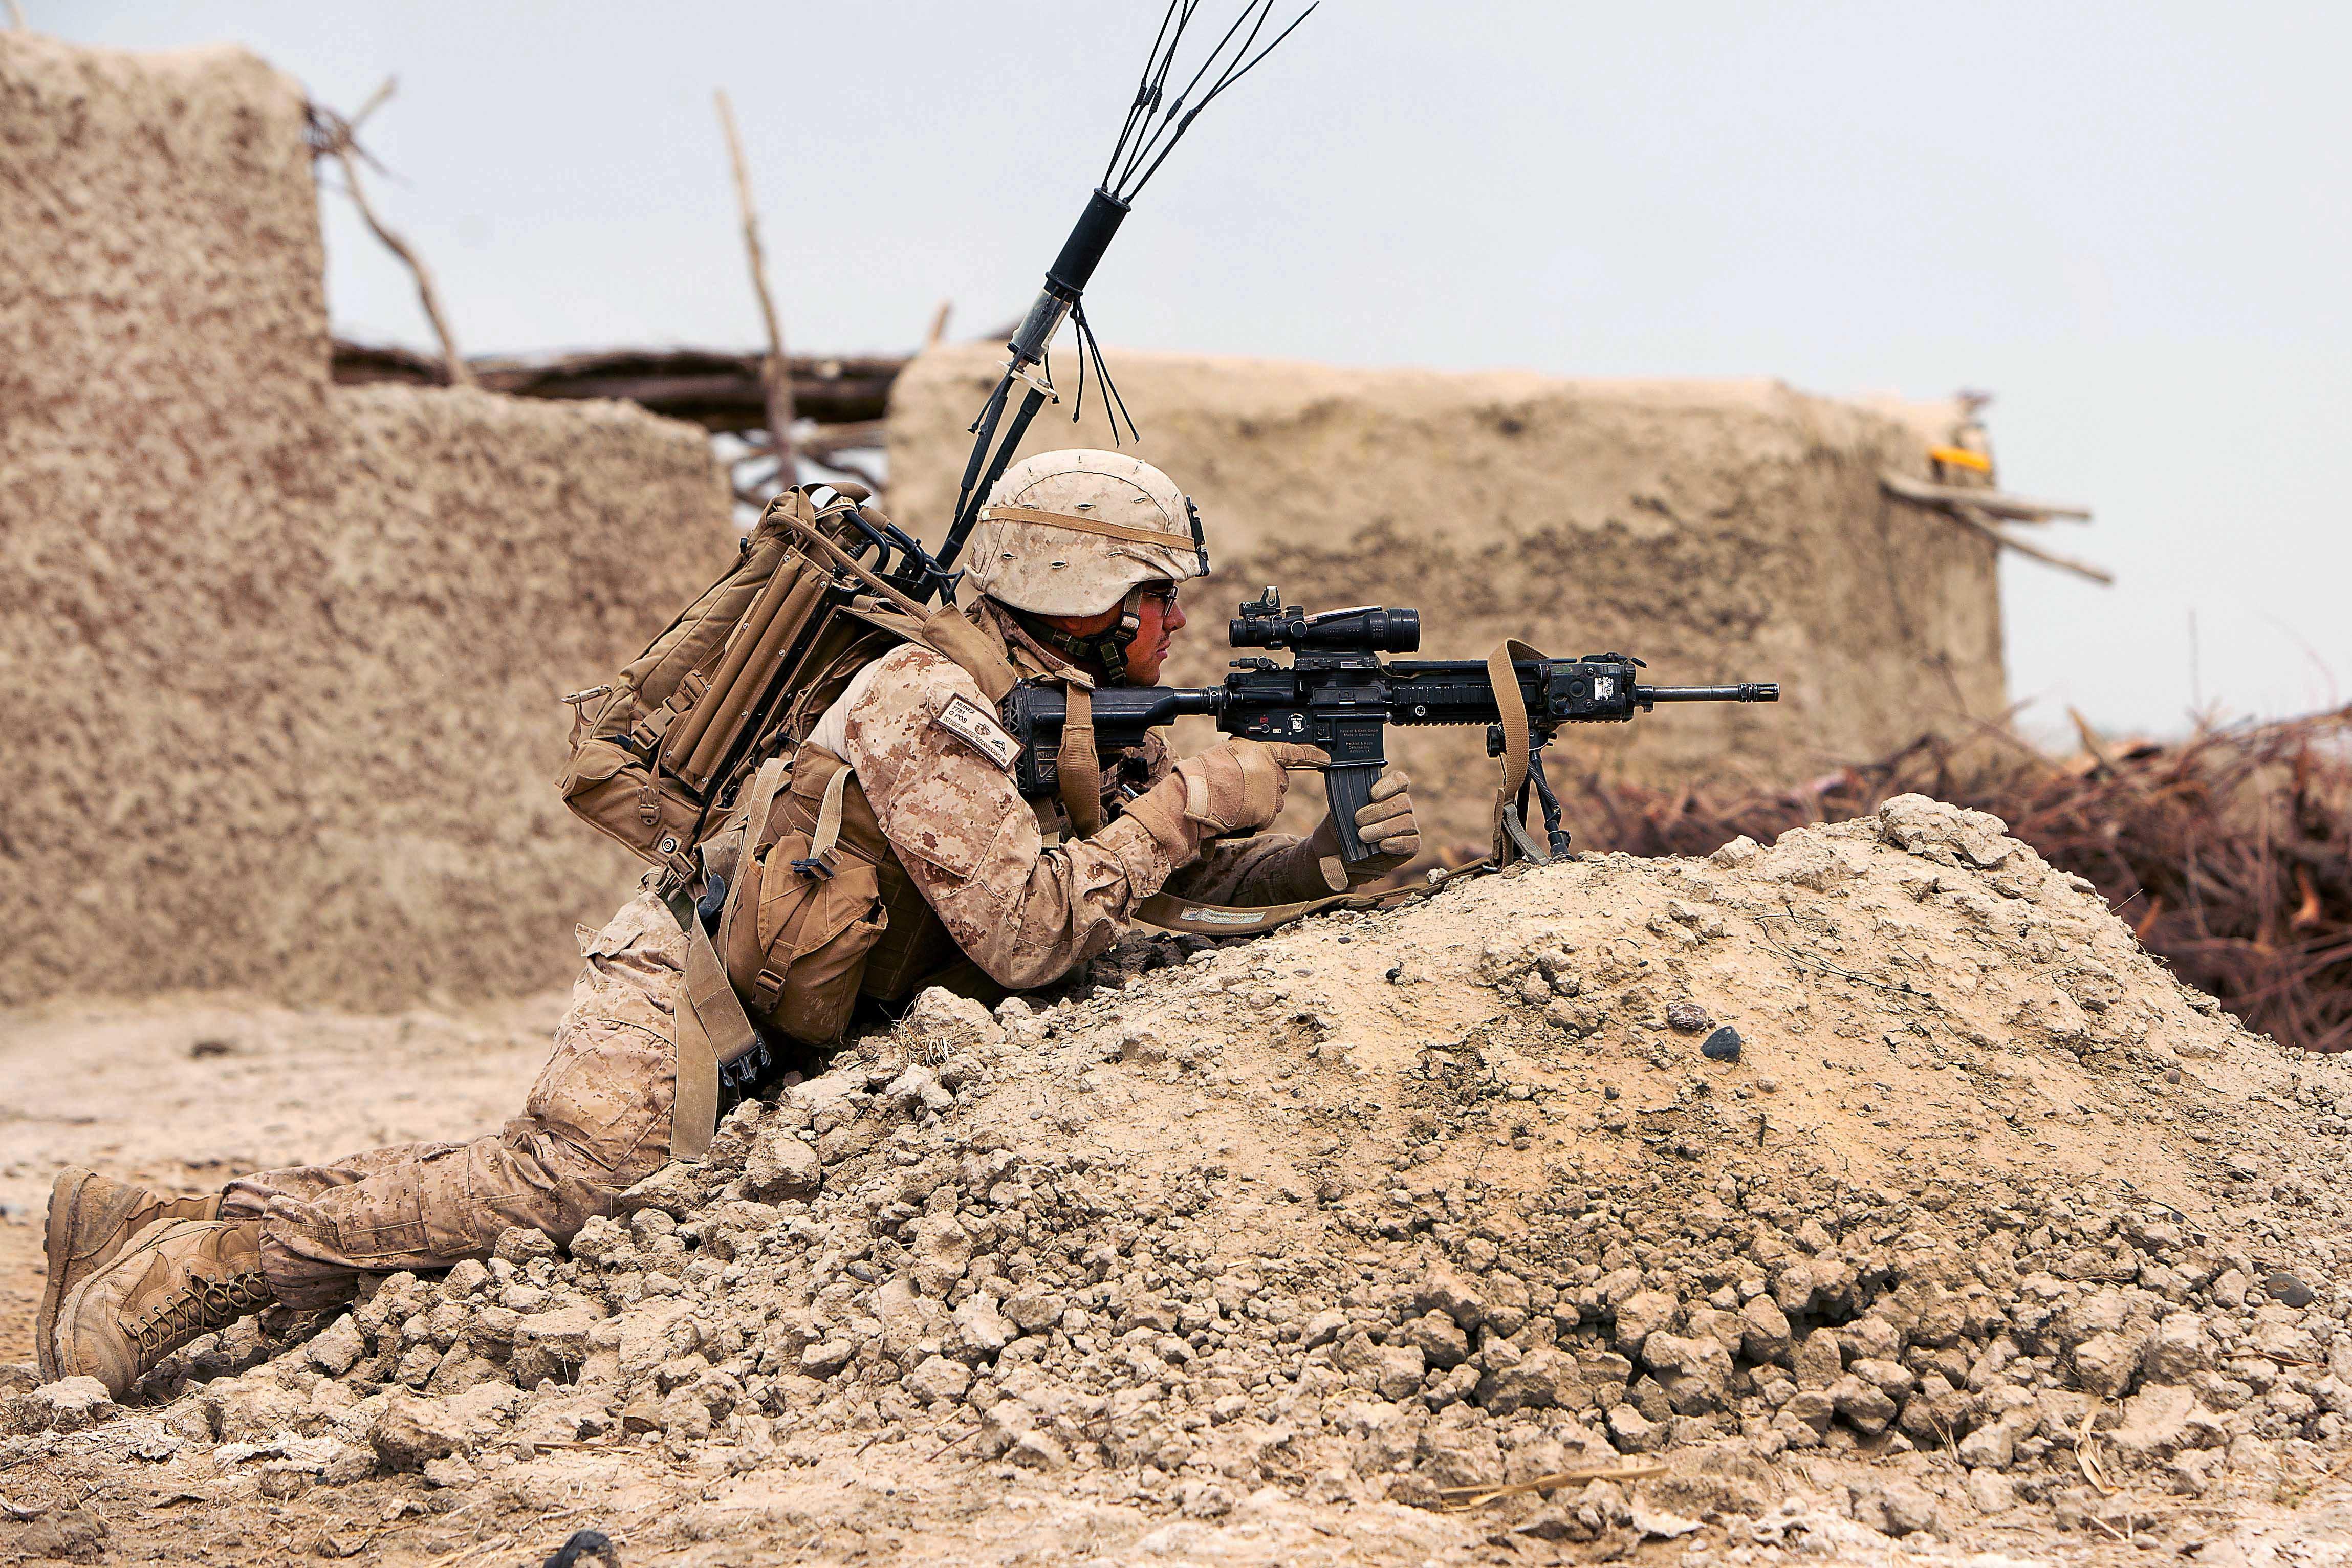 M27 Infantry Automatic Rifle Military Wiki Fandom